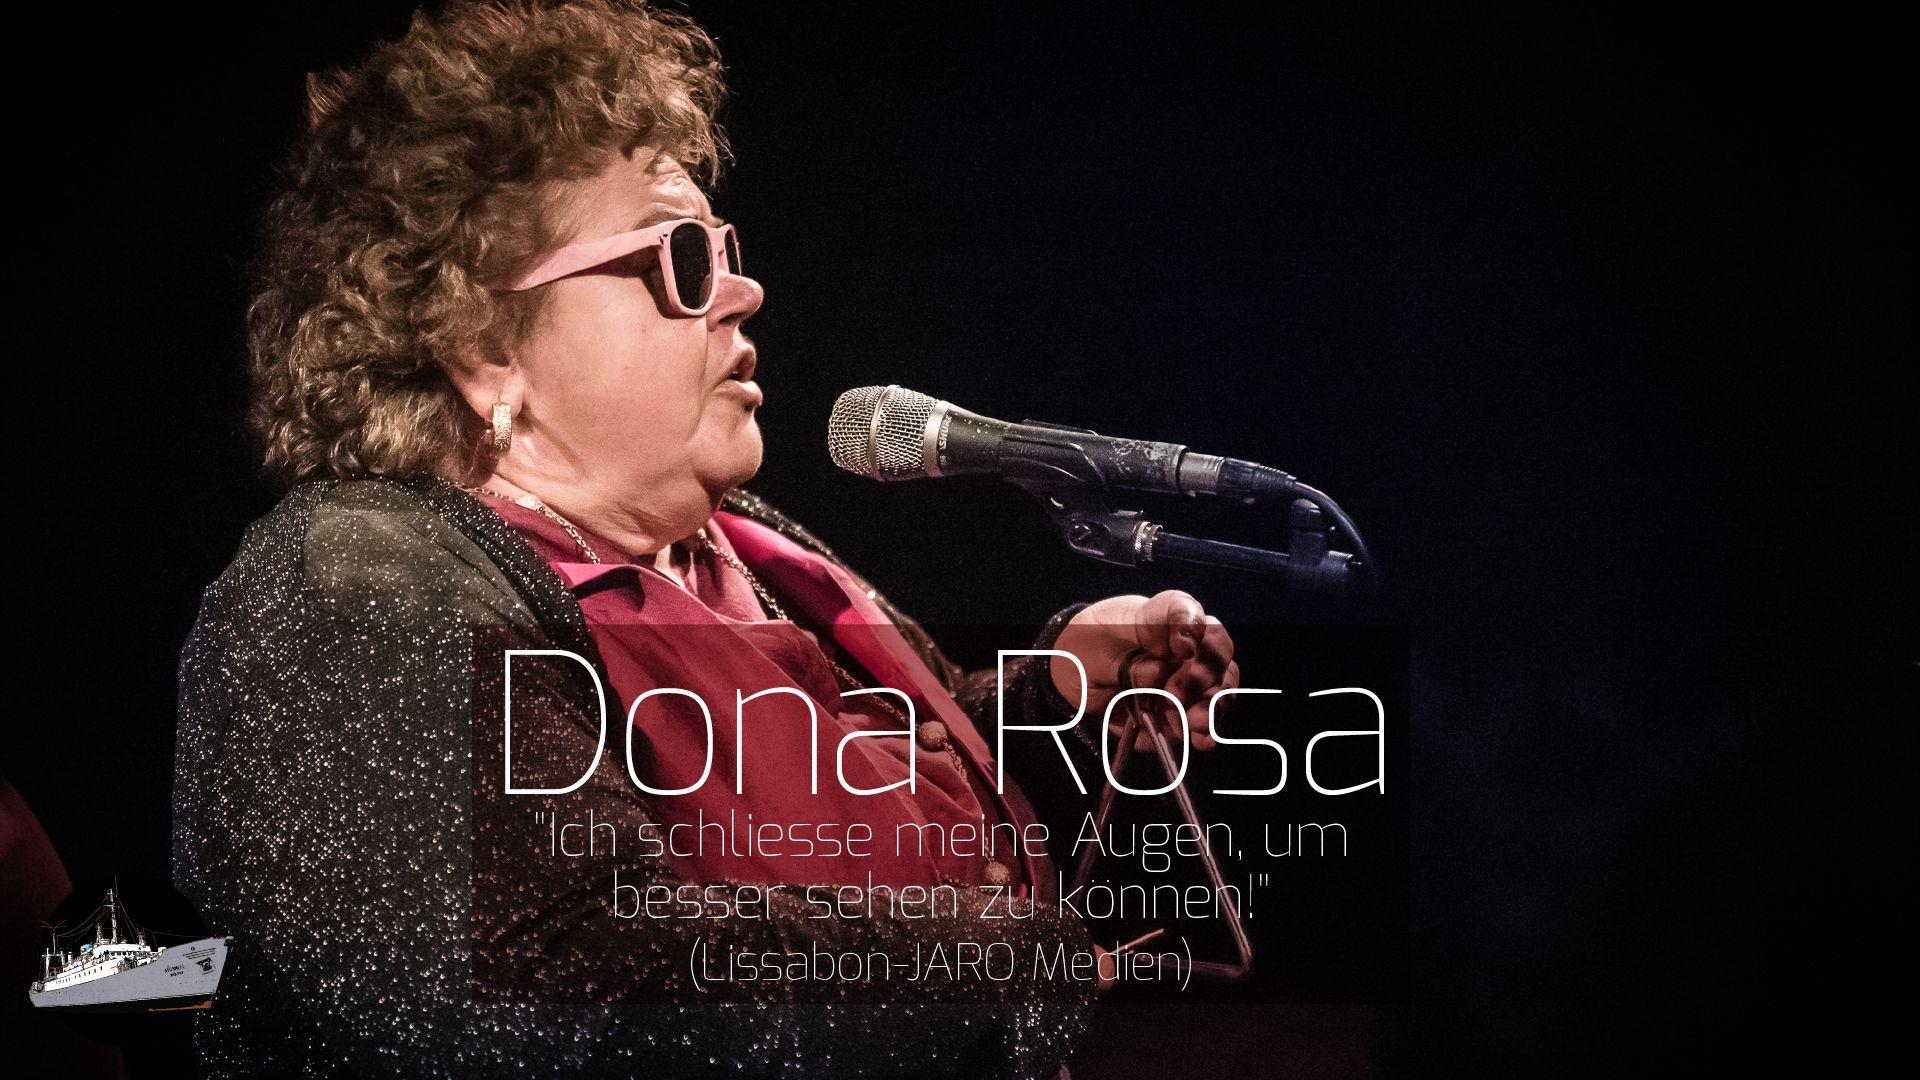 Preview: Dona Rosa (Lissabon/ Pt - JARO Medie